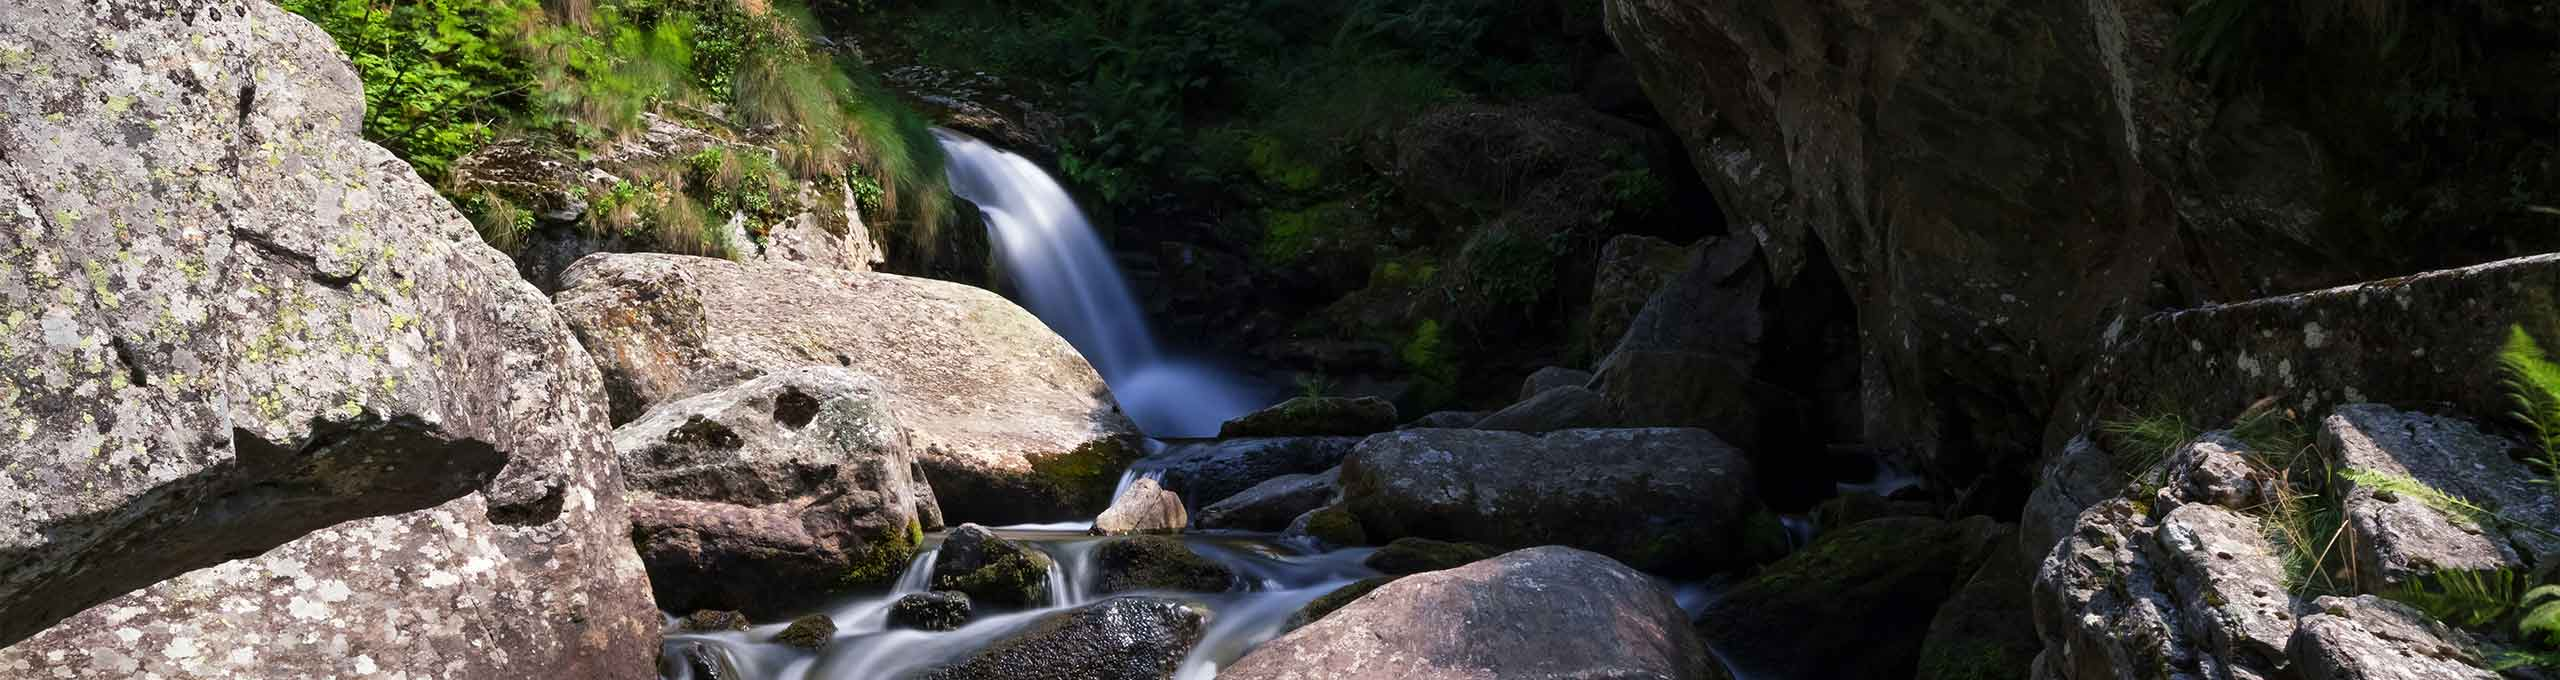 Monte Rosa natura incontaminata